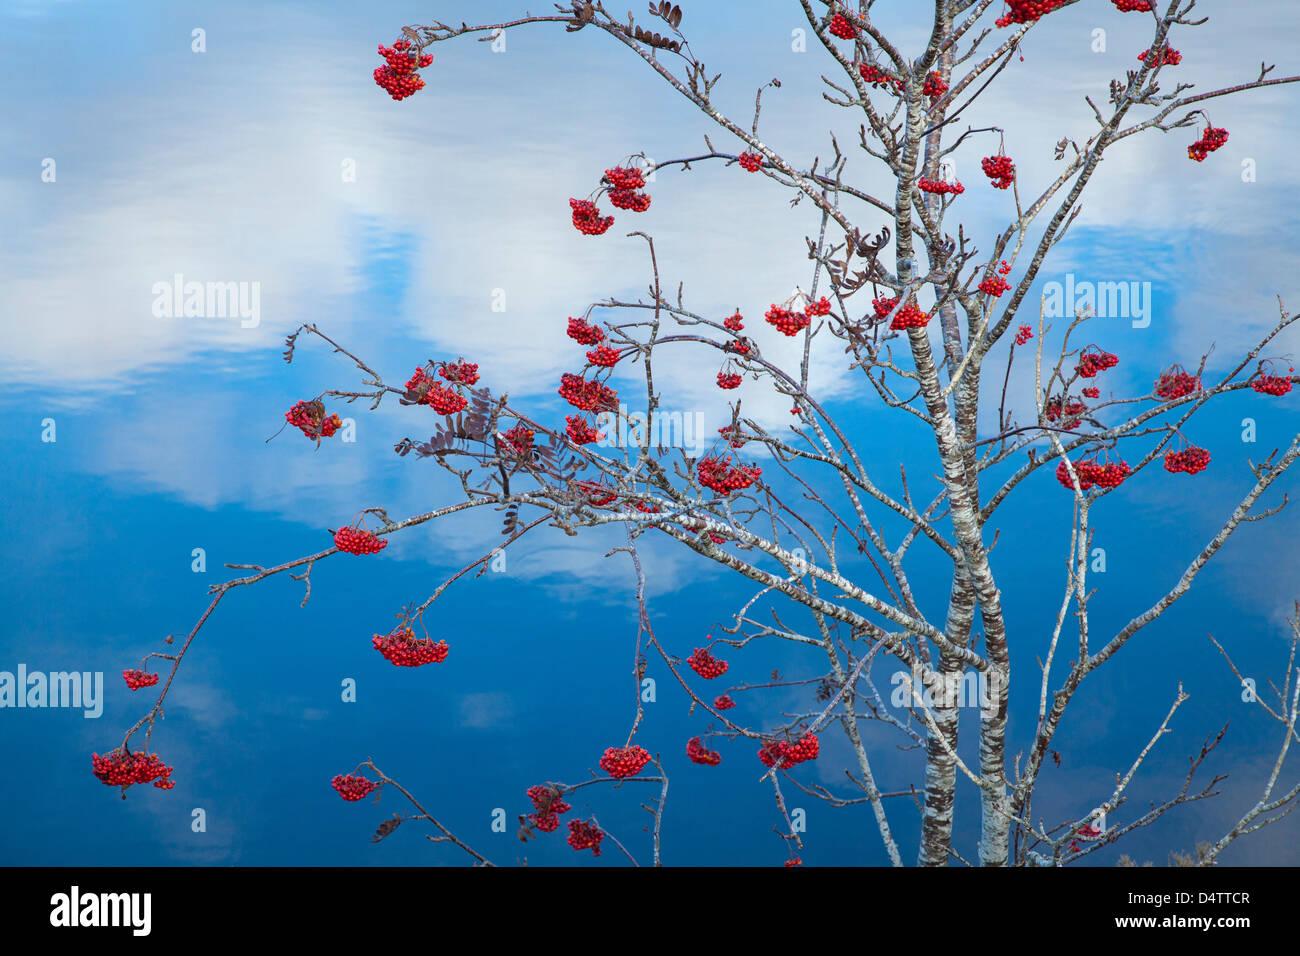 Autumn berries on a rowan tree (sorbus aucuparia) beside Lough Conn, Co Mayo, Ireland. Stock Photo